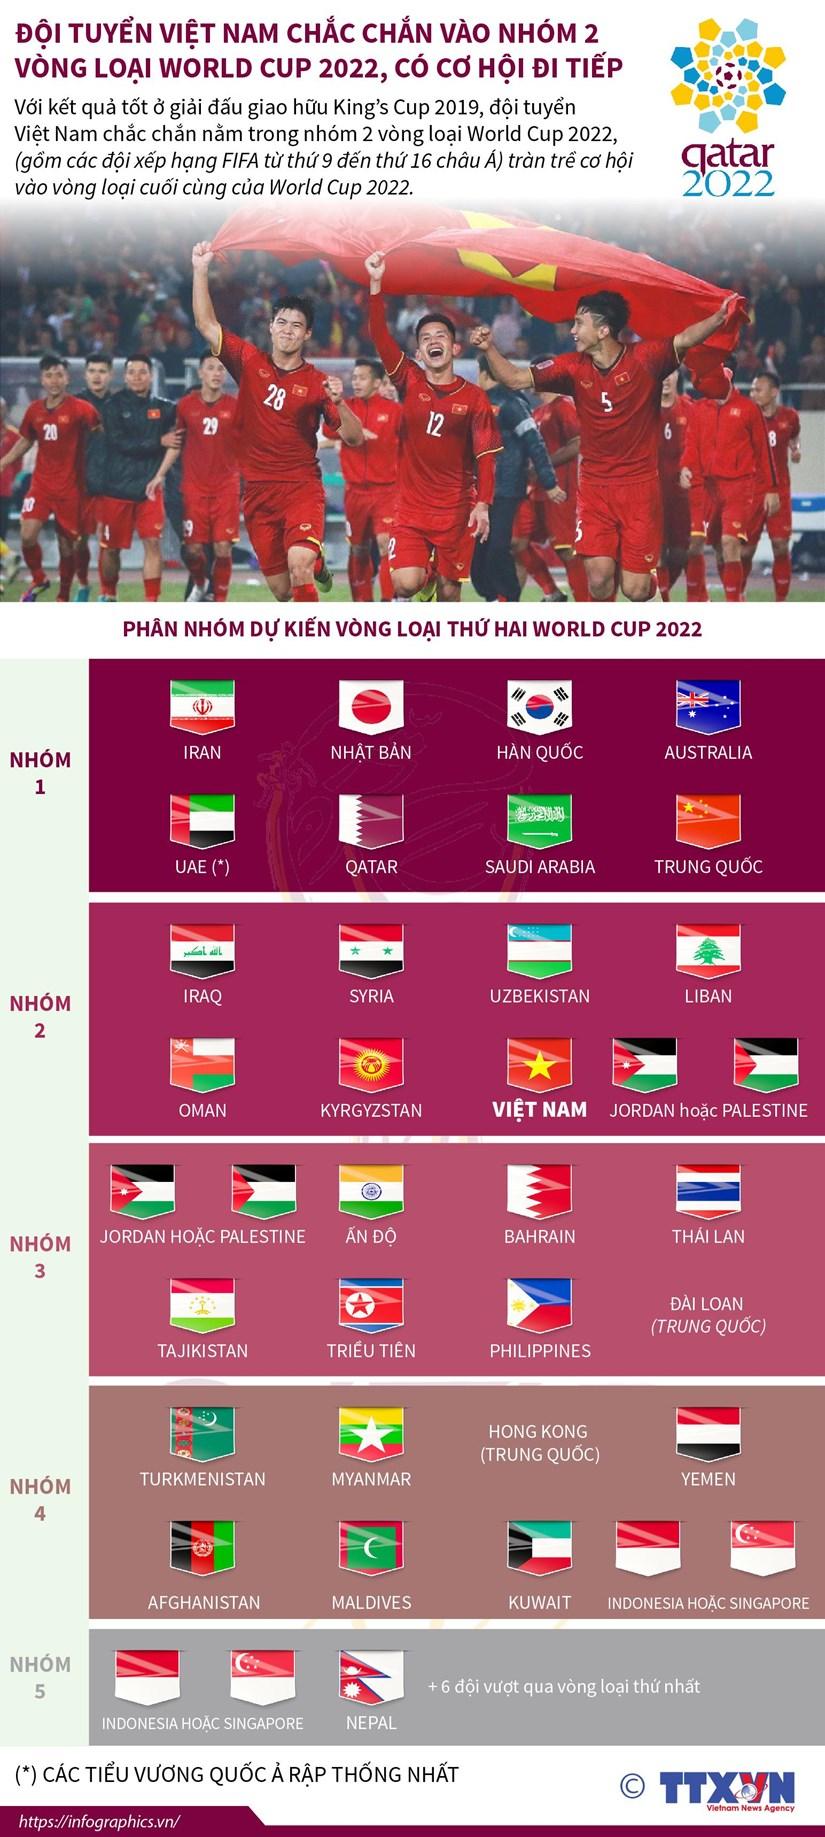 [Infographics] Doi tuyen Viet Nam vao nhom 2 vong loai World Cup 2022 hinh anh 1